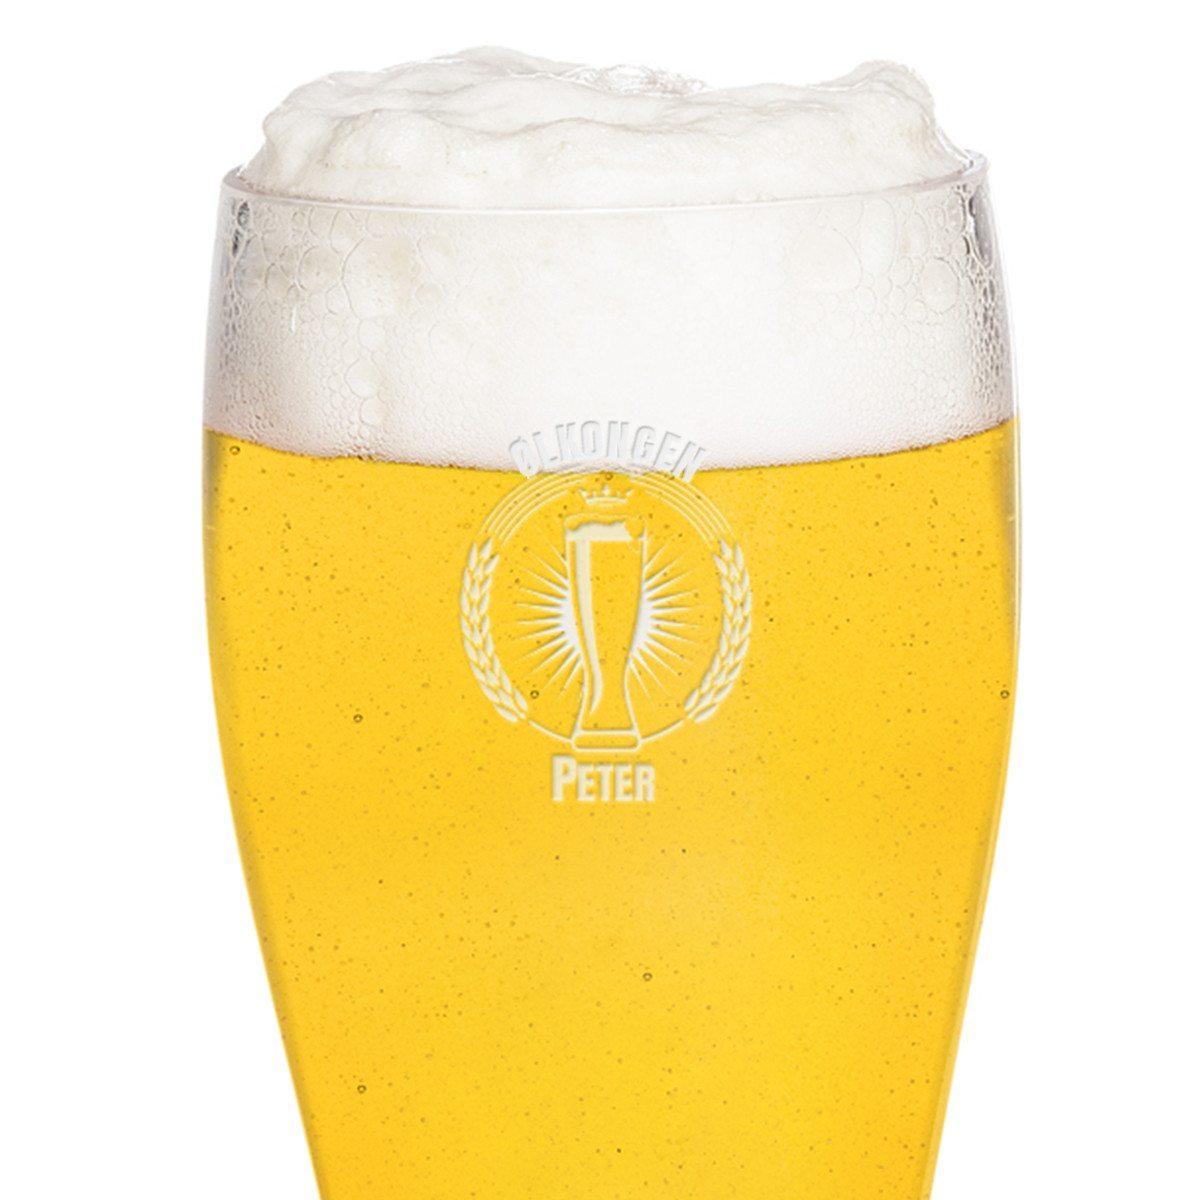 XXL ølstøvle med indgravering